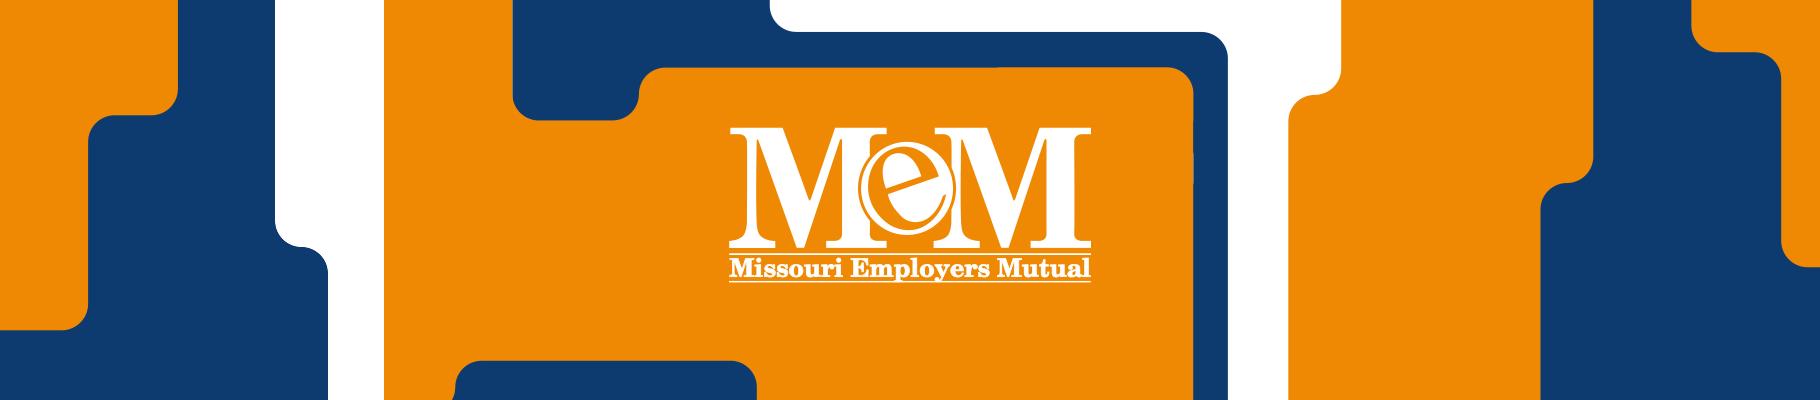 Missouri Employers Mutual logo on orange, blue and white graphics banner